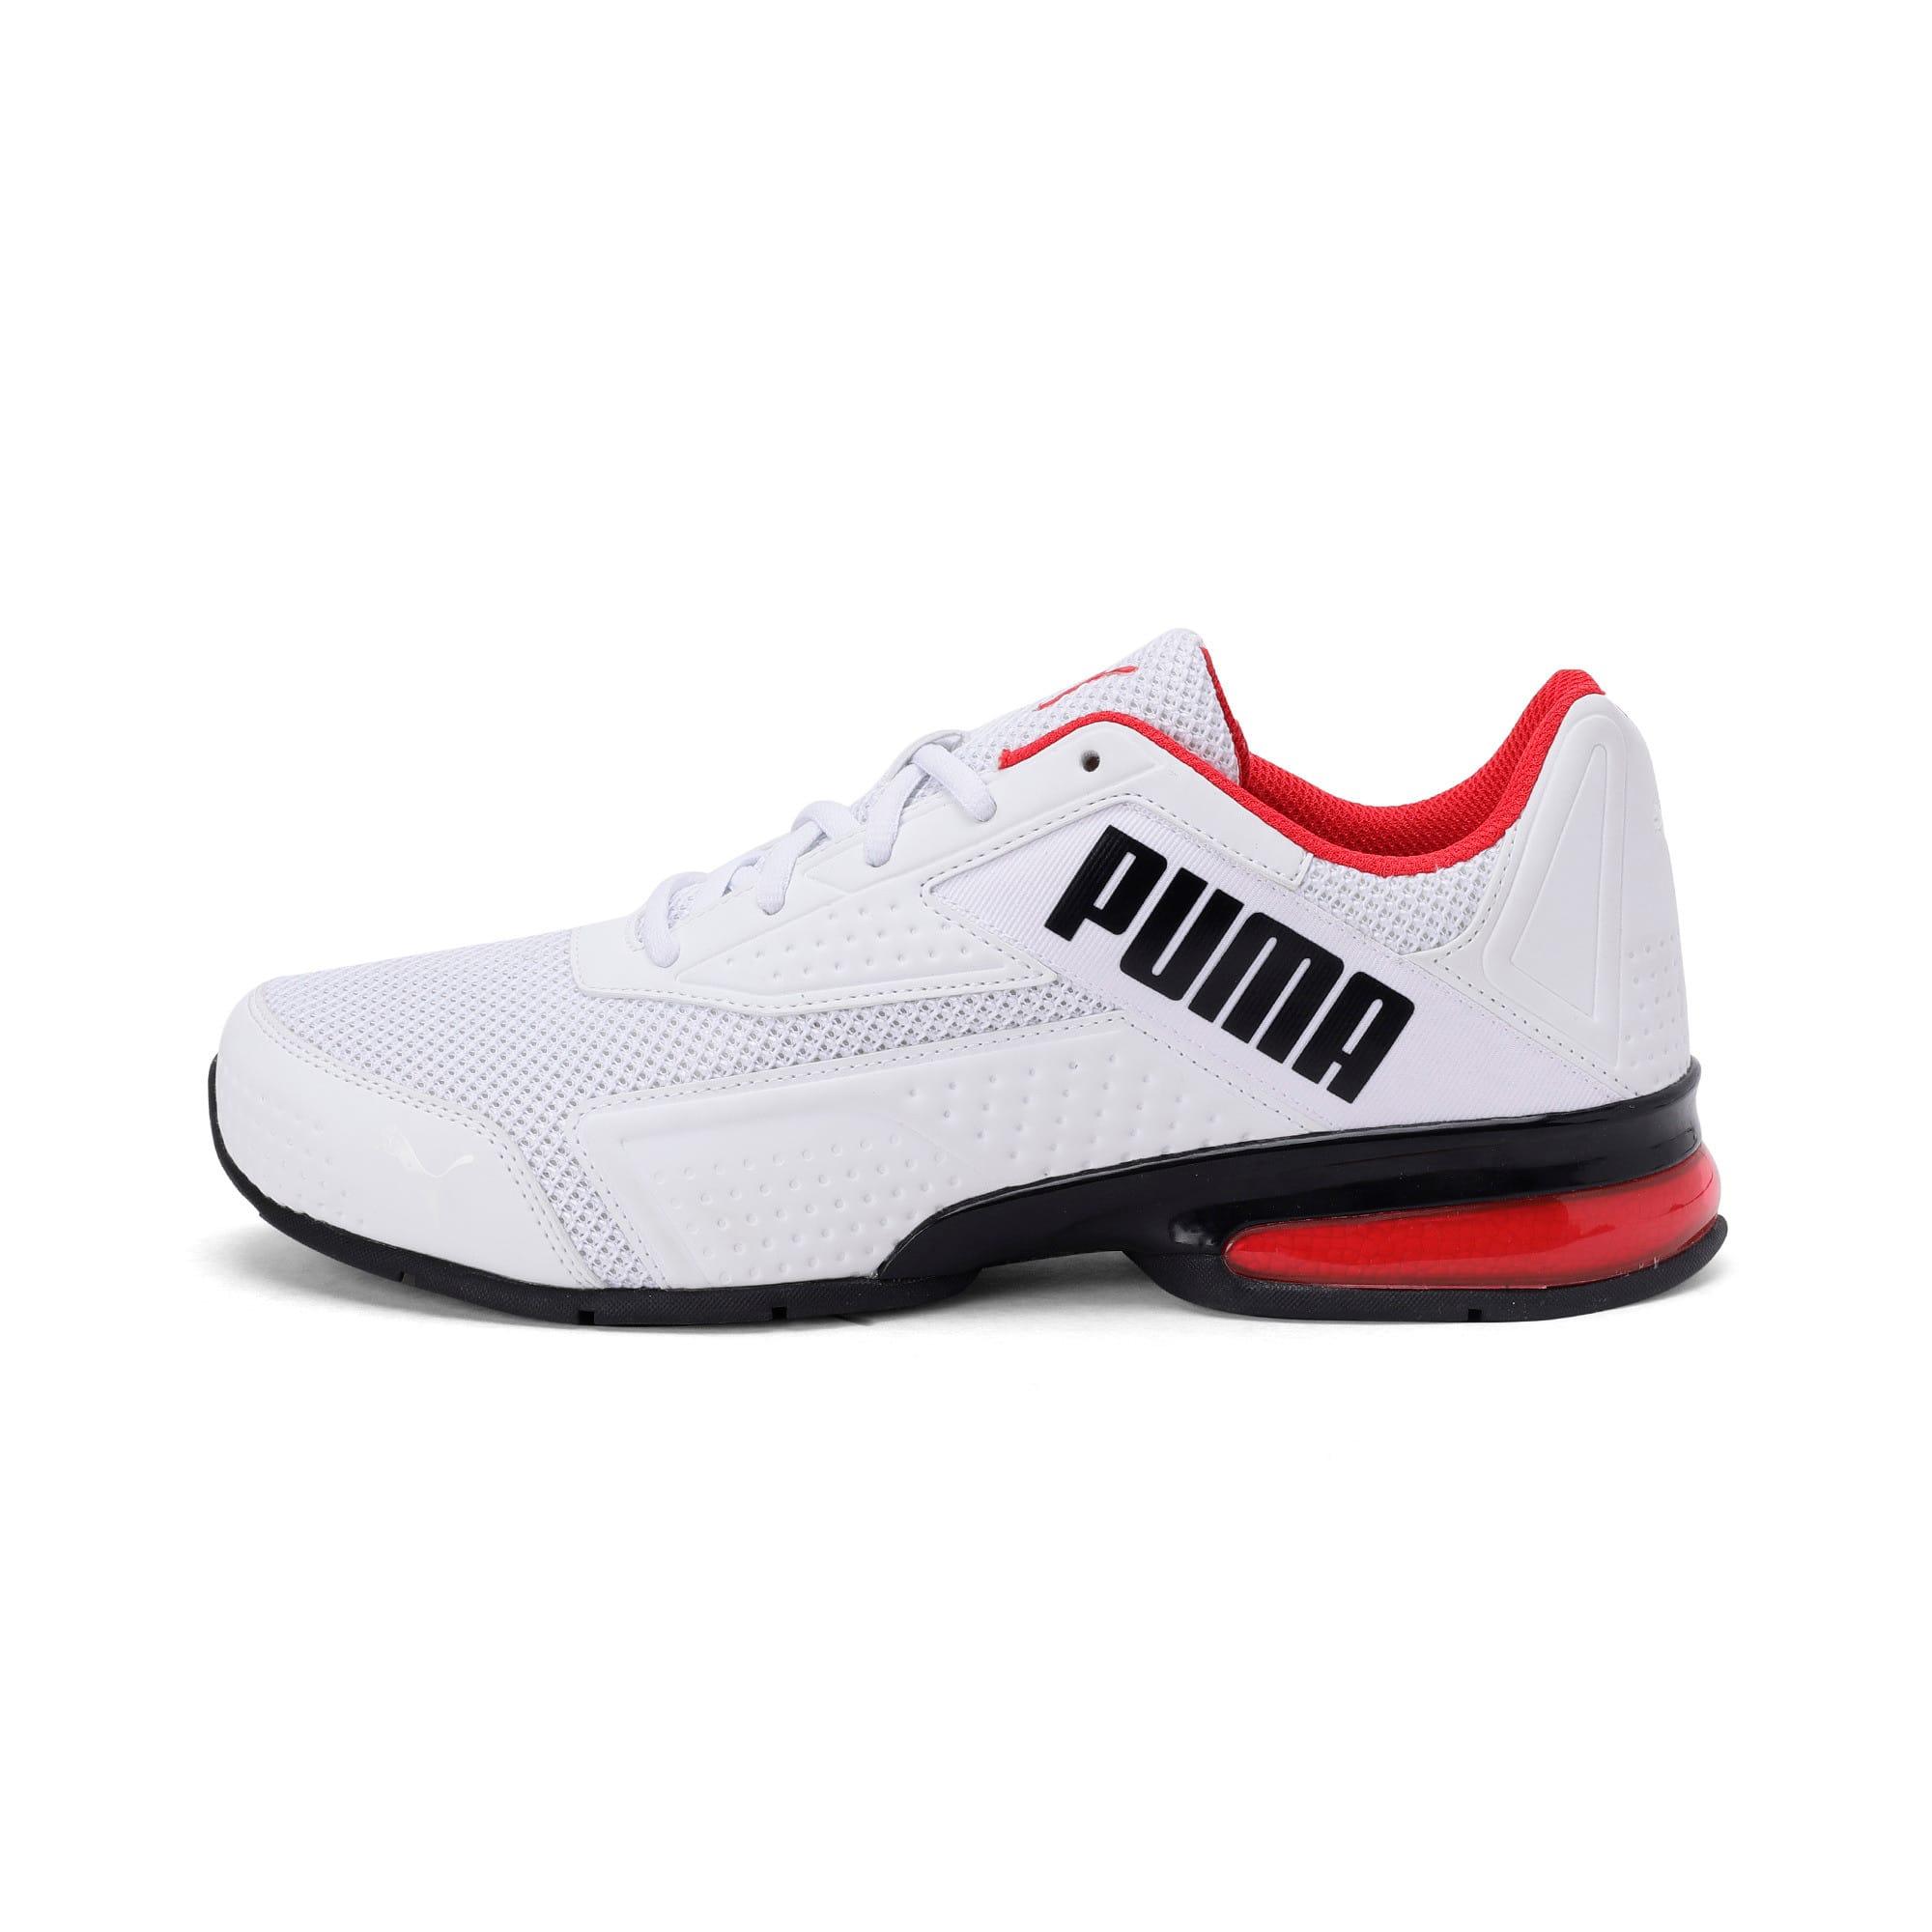 Thumbnail 1 of Leader VT NU Training Shoes, Puma Wht-Hgh Rsk Rd-Pma Blk, medium-IND